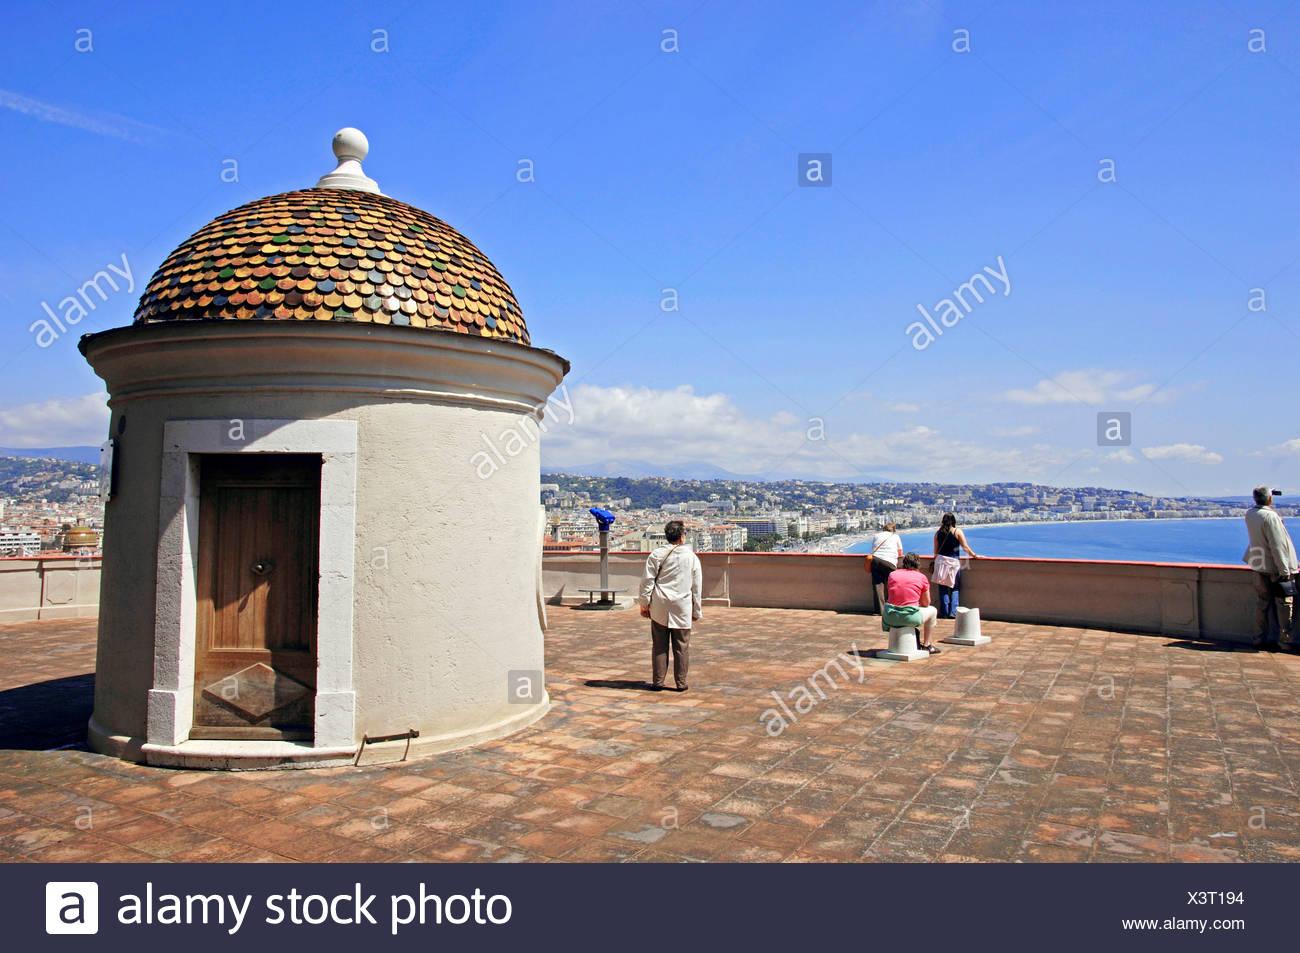 Sentry-box, Tower la Tour Bellanda, Nice, Alpes-Maritimes, Provence-Alpes-Cote d'Azur, Southern France, France, Europe Stock Photo